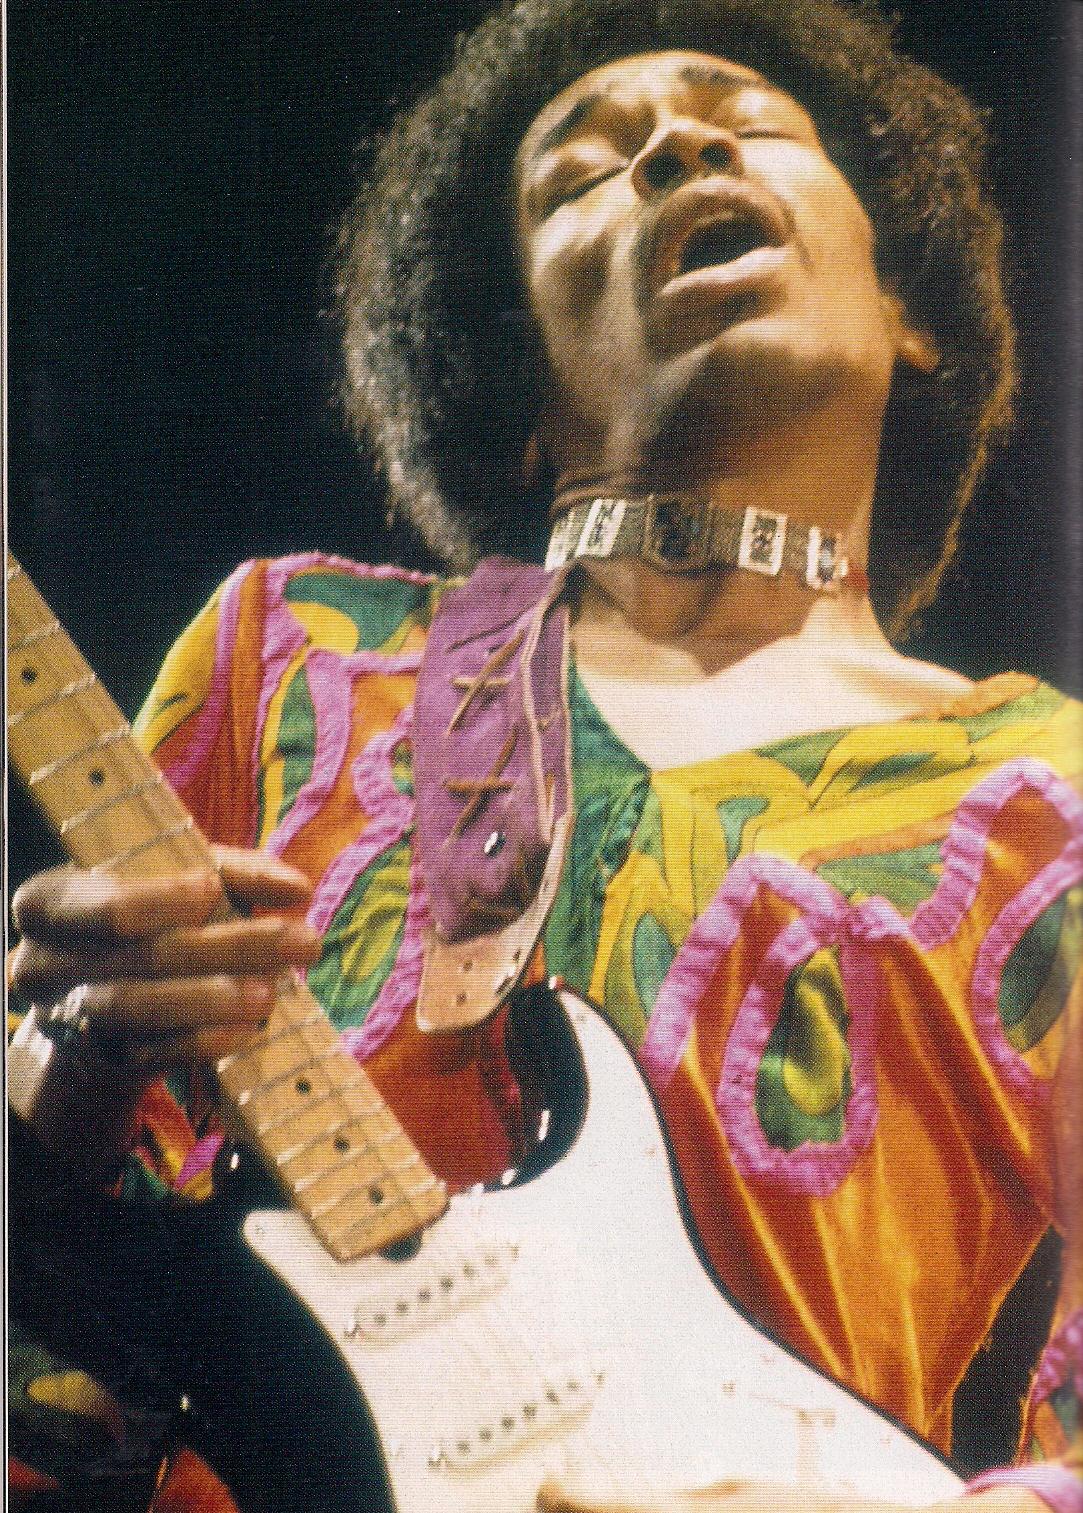 Blue Wild Angel: Jimi Hendrix Live At The Isle Of Wight (2002) - Page 2 682f949ad47e7bf3310dfa0760f578c5